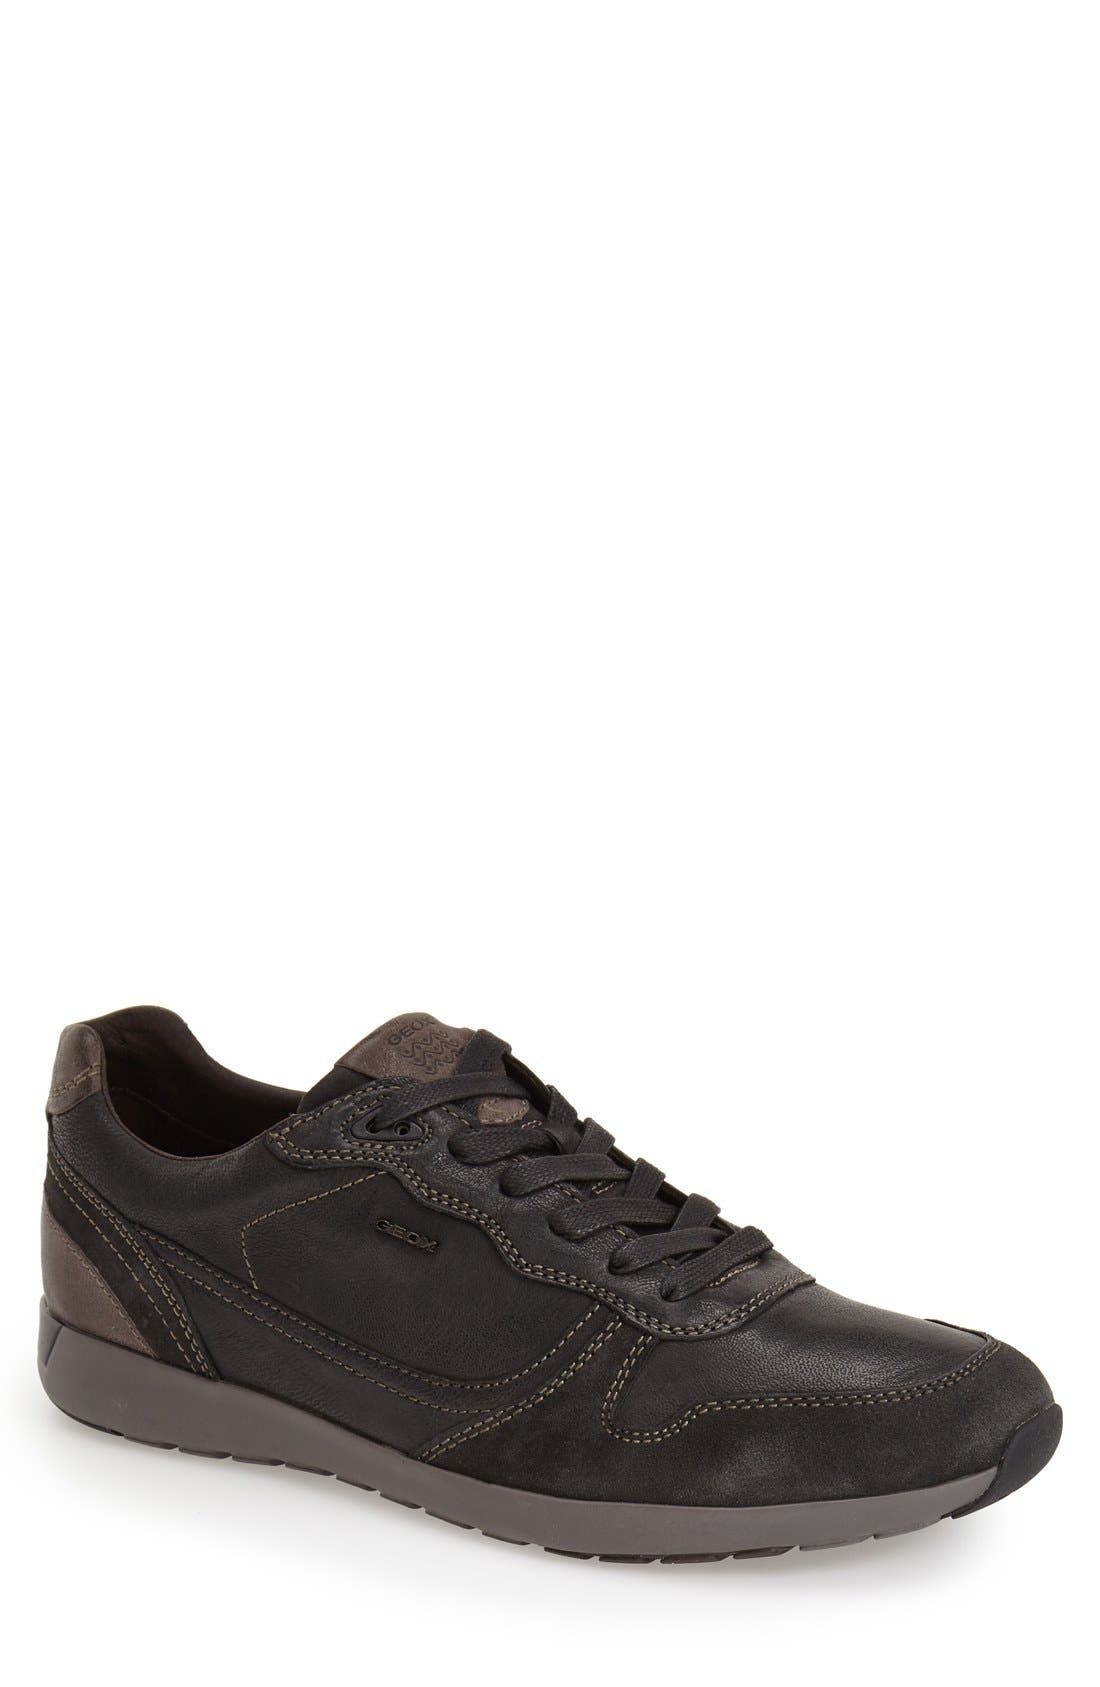 'Jepson' Sneaker, Main, color, 001